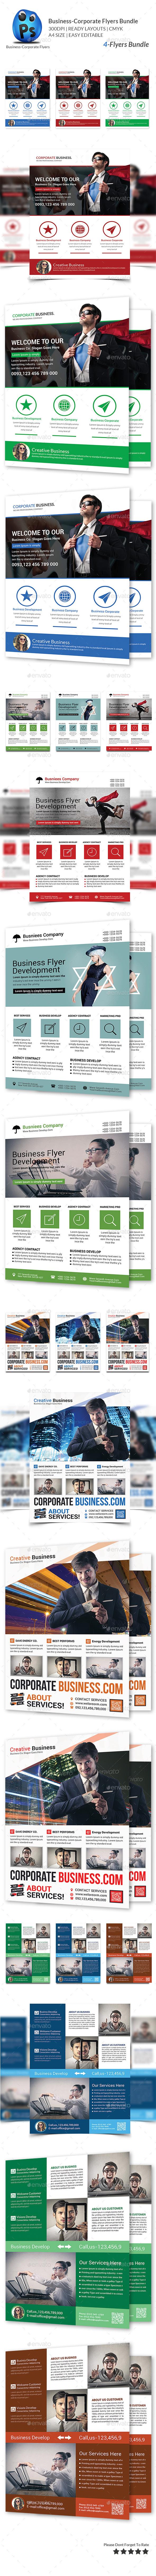 Corporate Business 4 Flyer Bundle - Flyers Print Templates